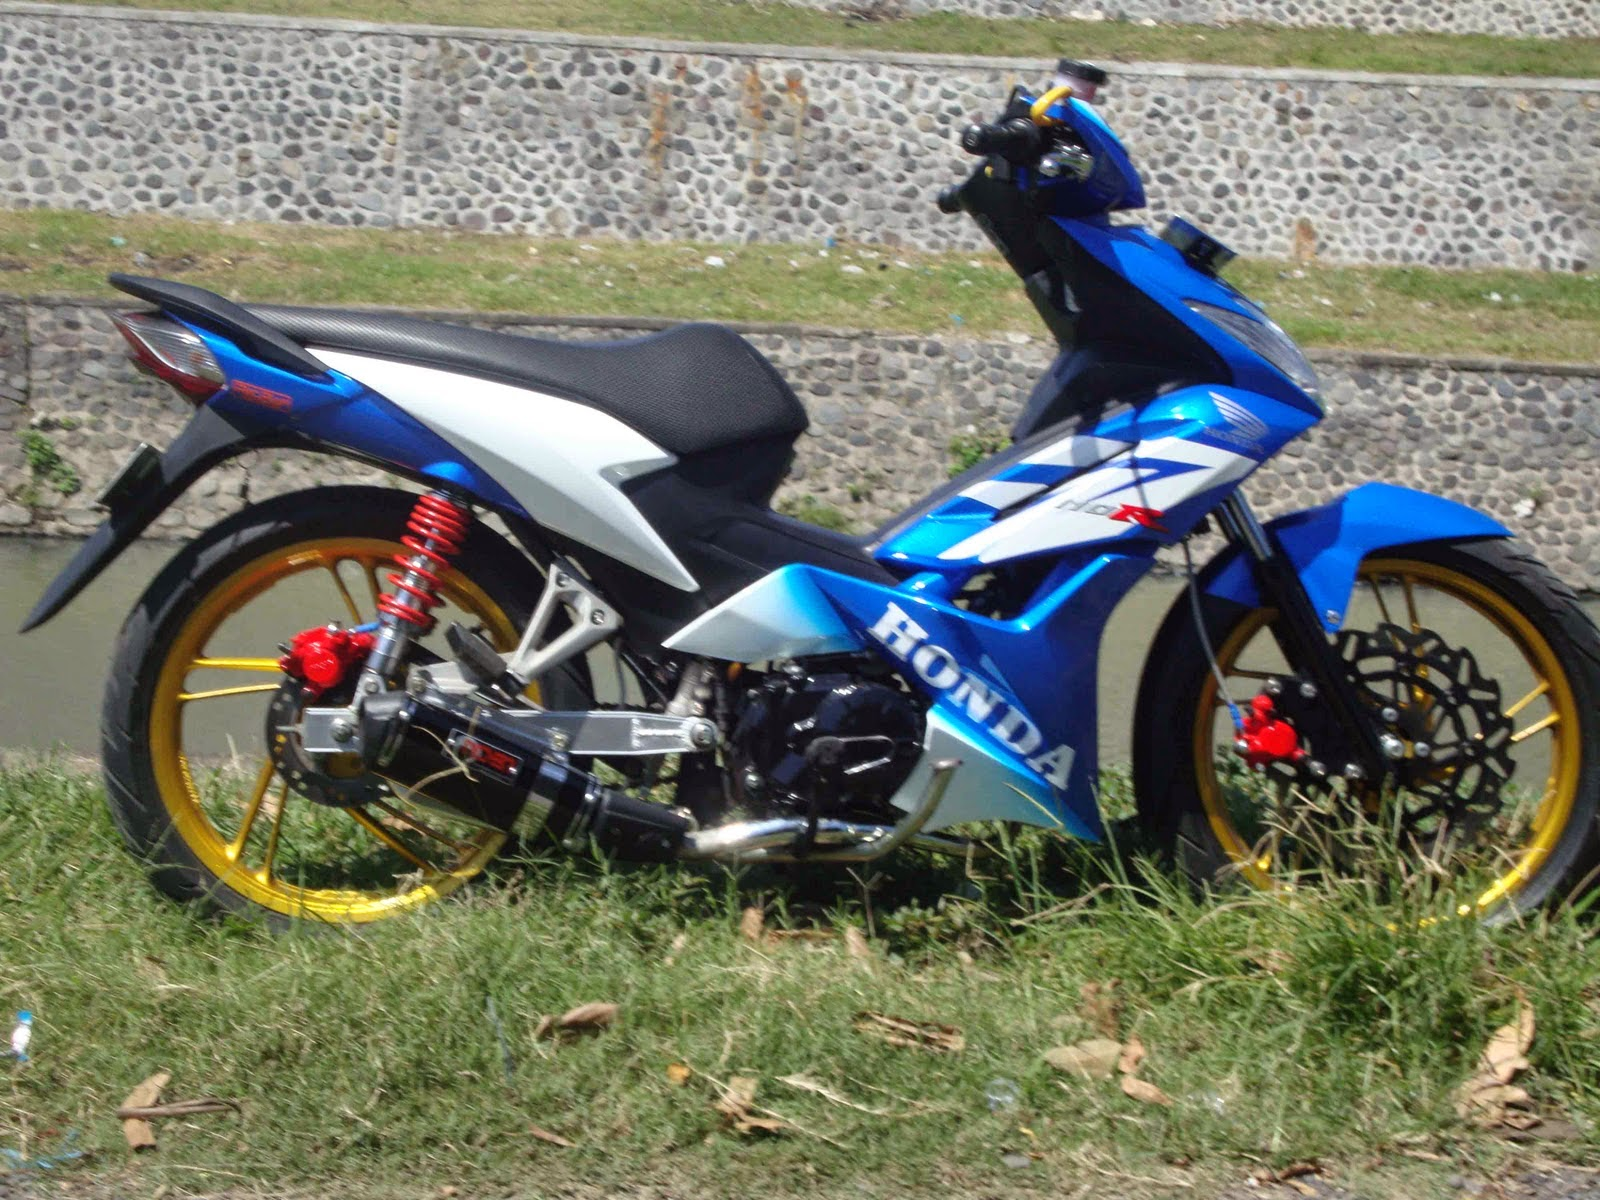 Modifikasi Motor Honda Blade Repsol  Thecitycyclist